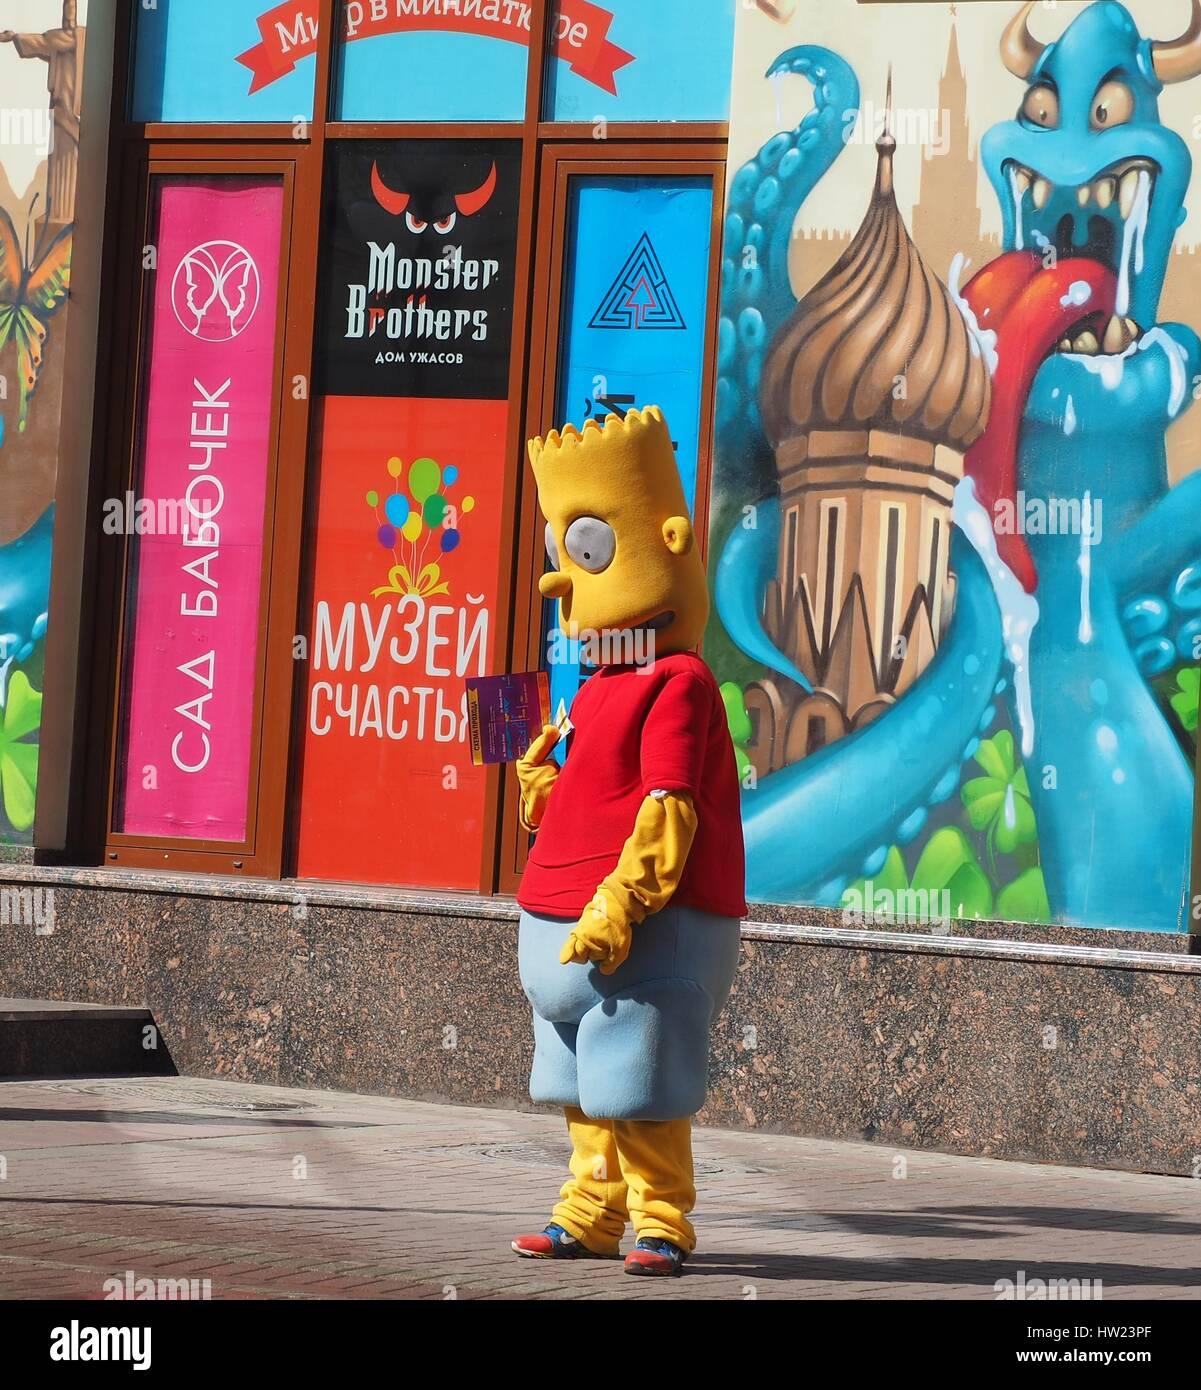 Bart Simpson Disfraz Foto Imagen De Stock 135885863 Alamy - Disfraces-simpsons